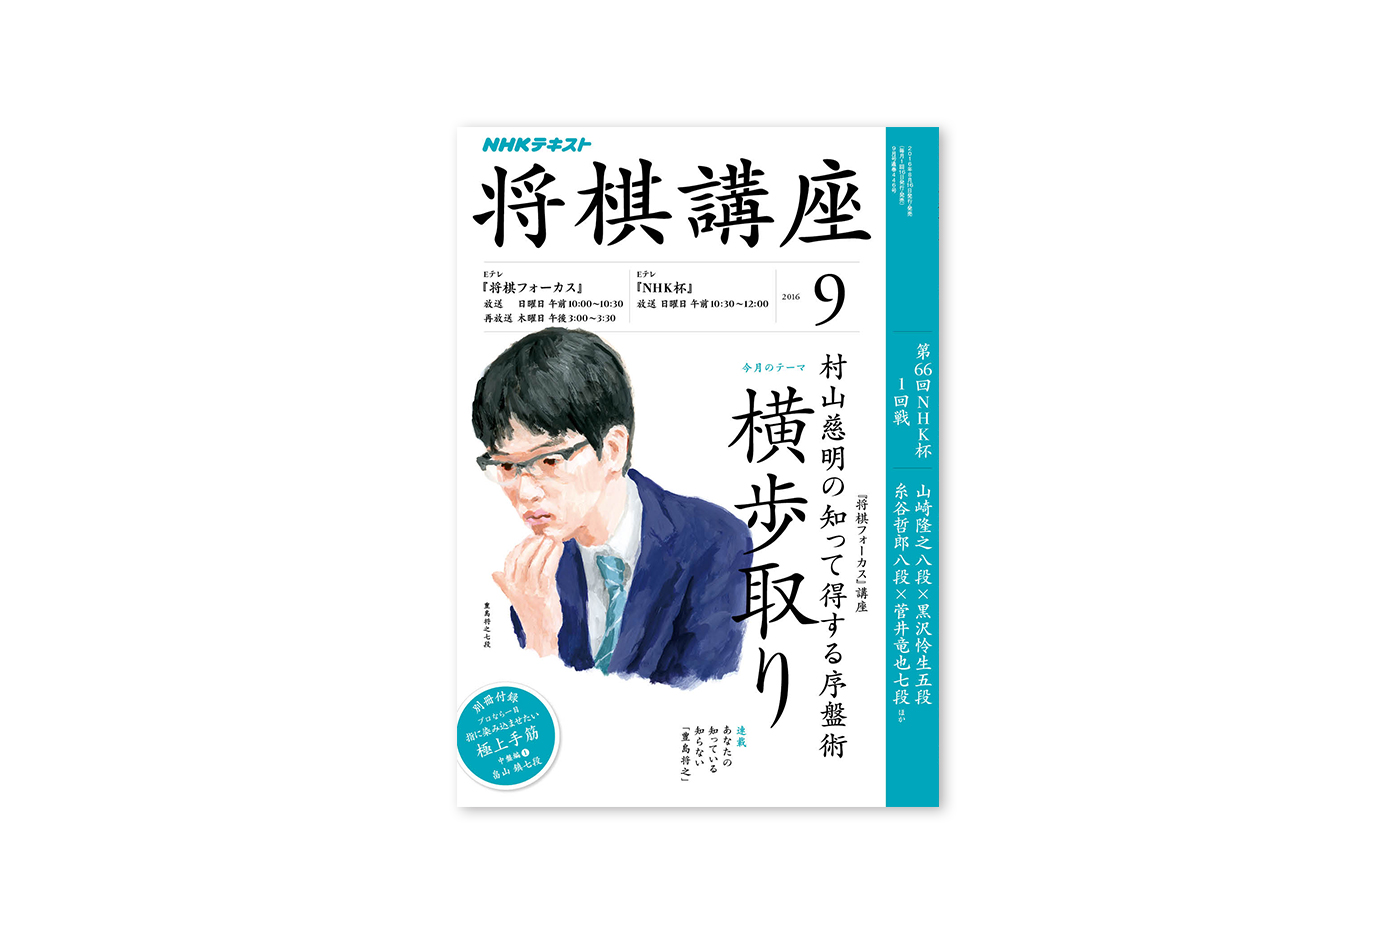 syogi_2016_9+